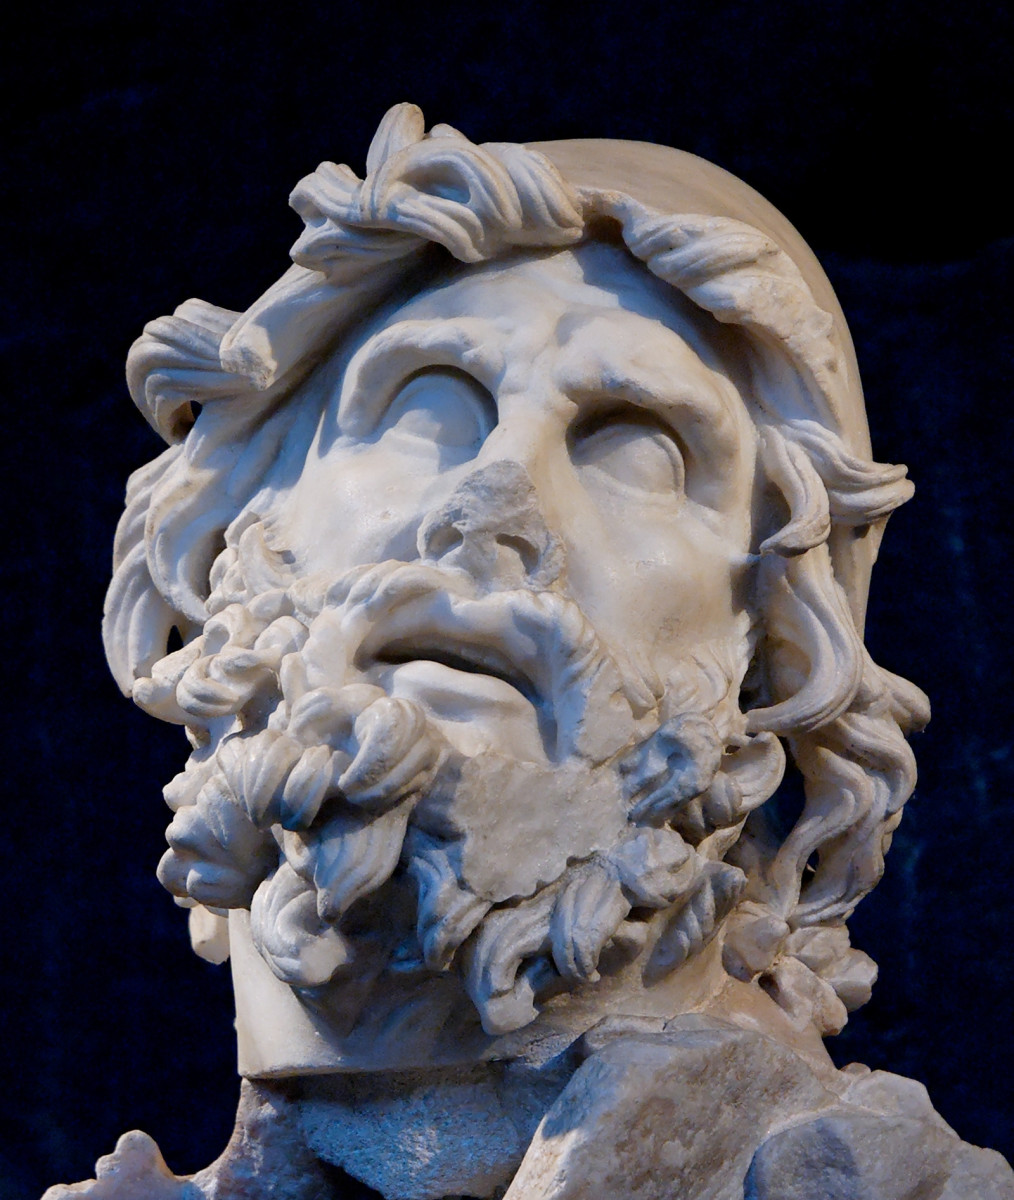 Comparison of Ram and Odysseus